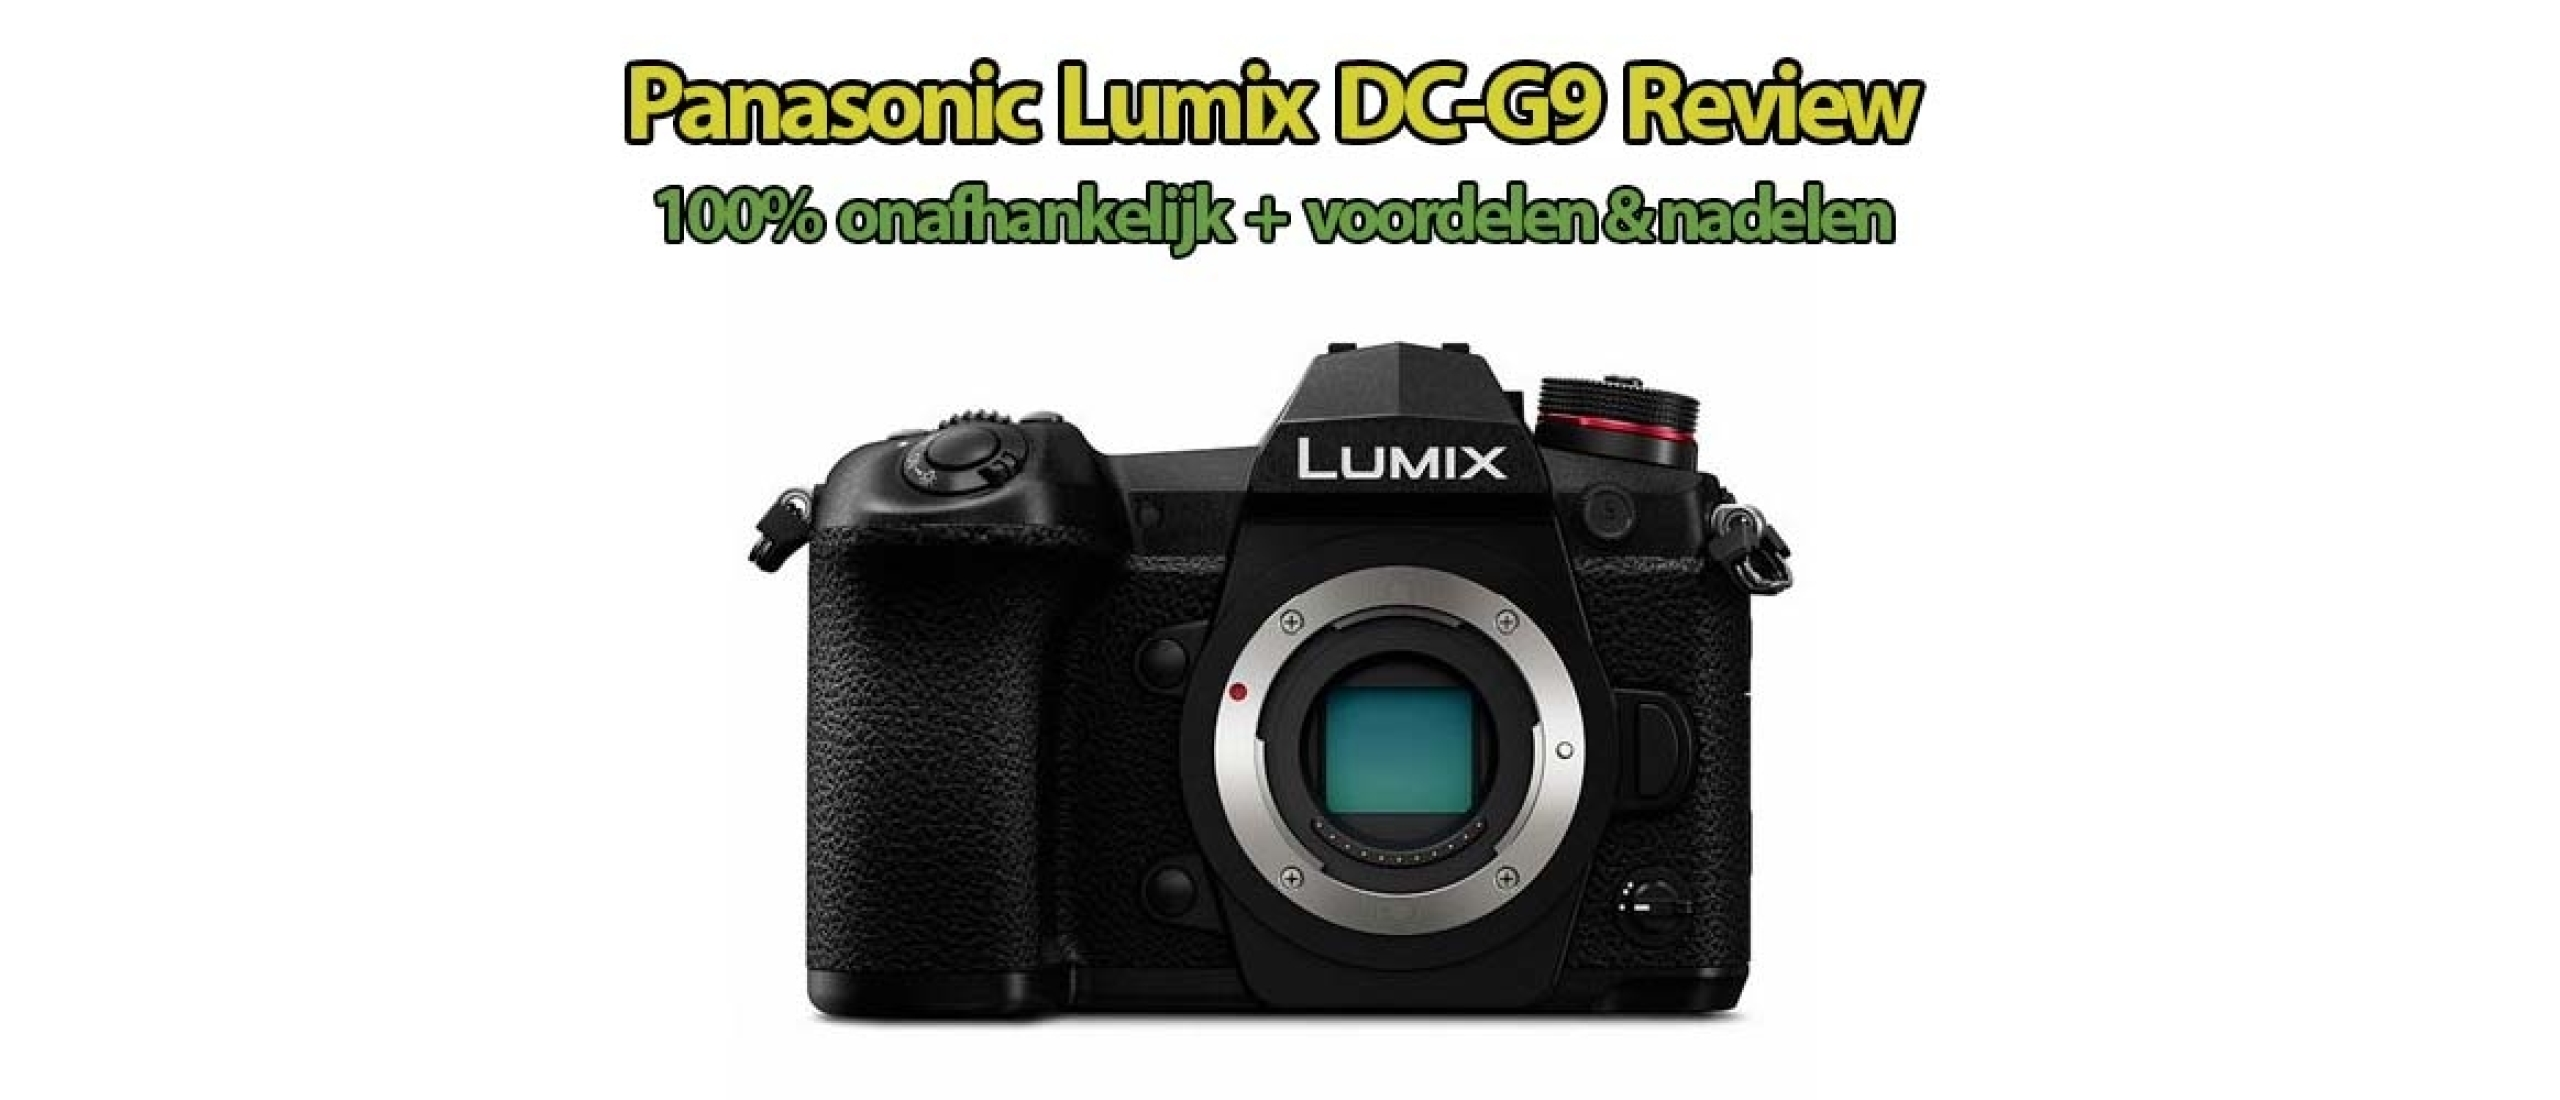 Panasonic G9 Systeemcamera Review